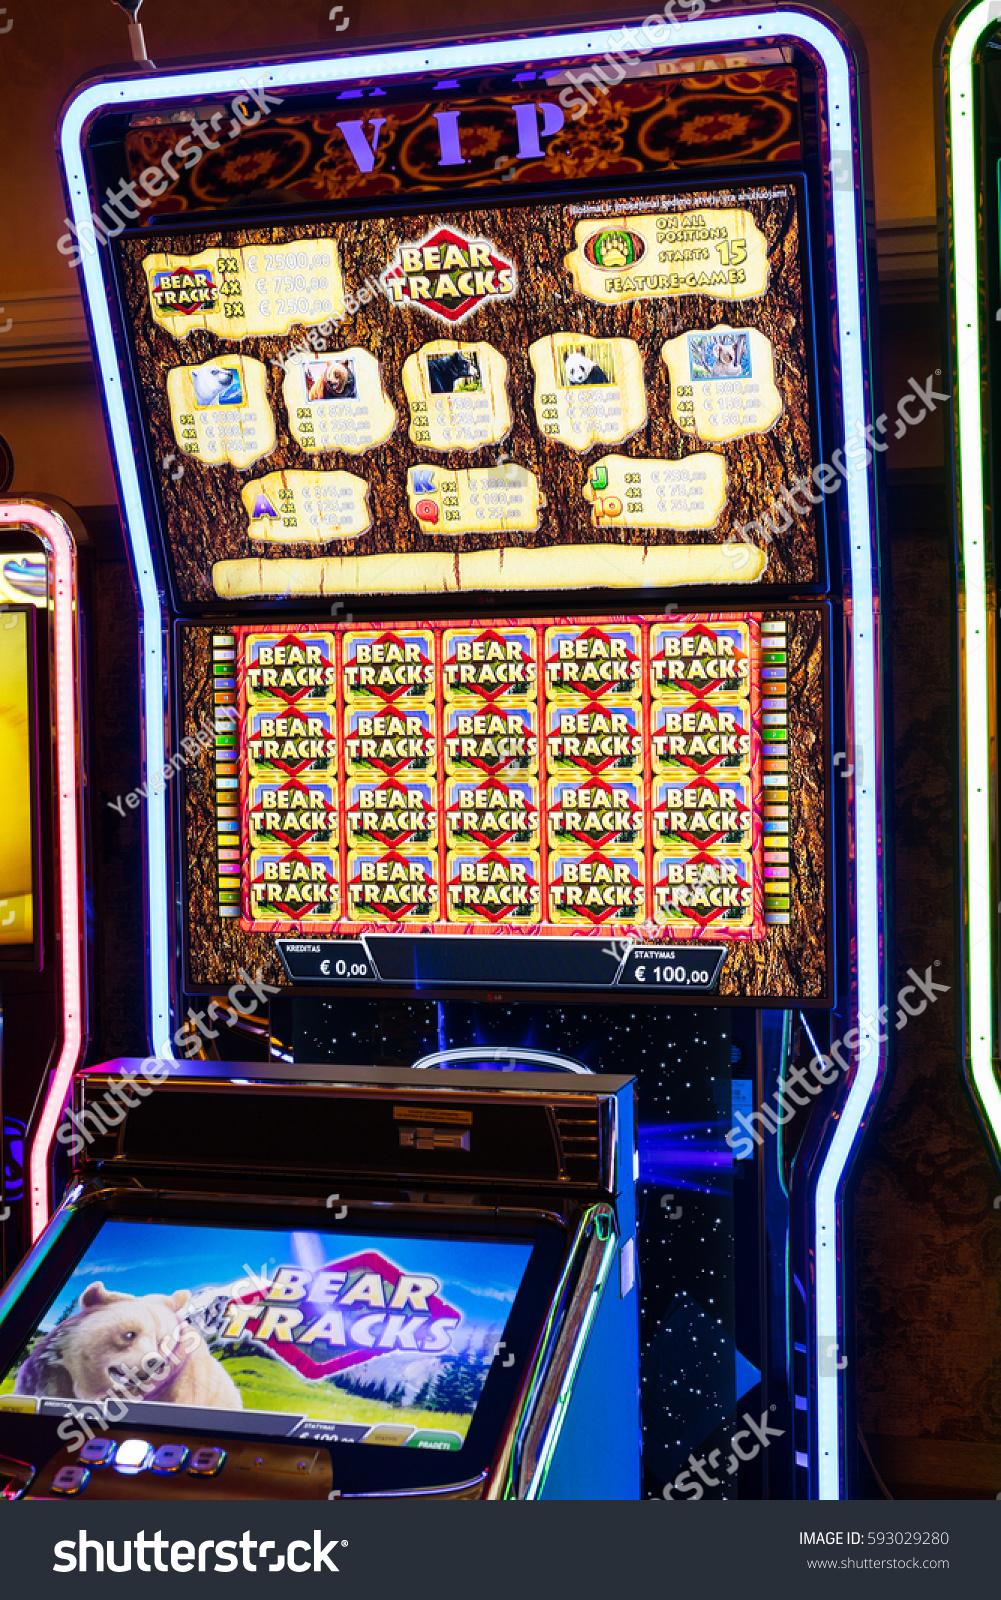 24 casino slot